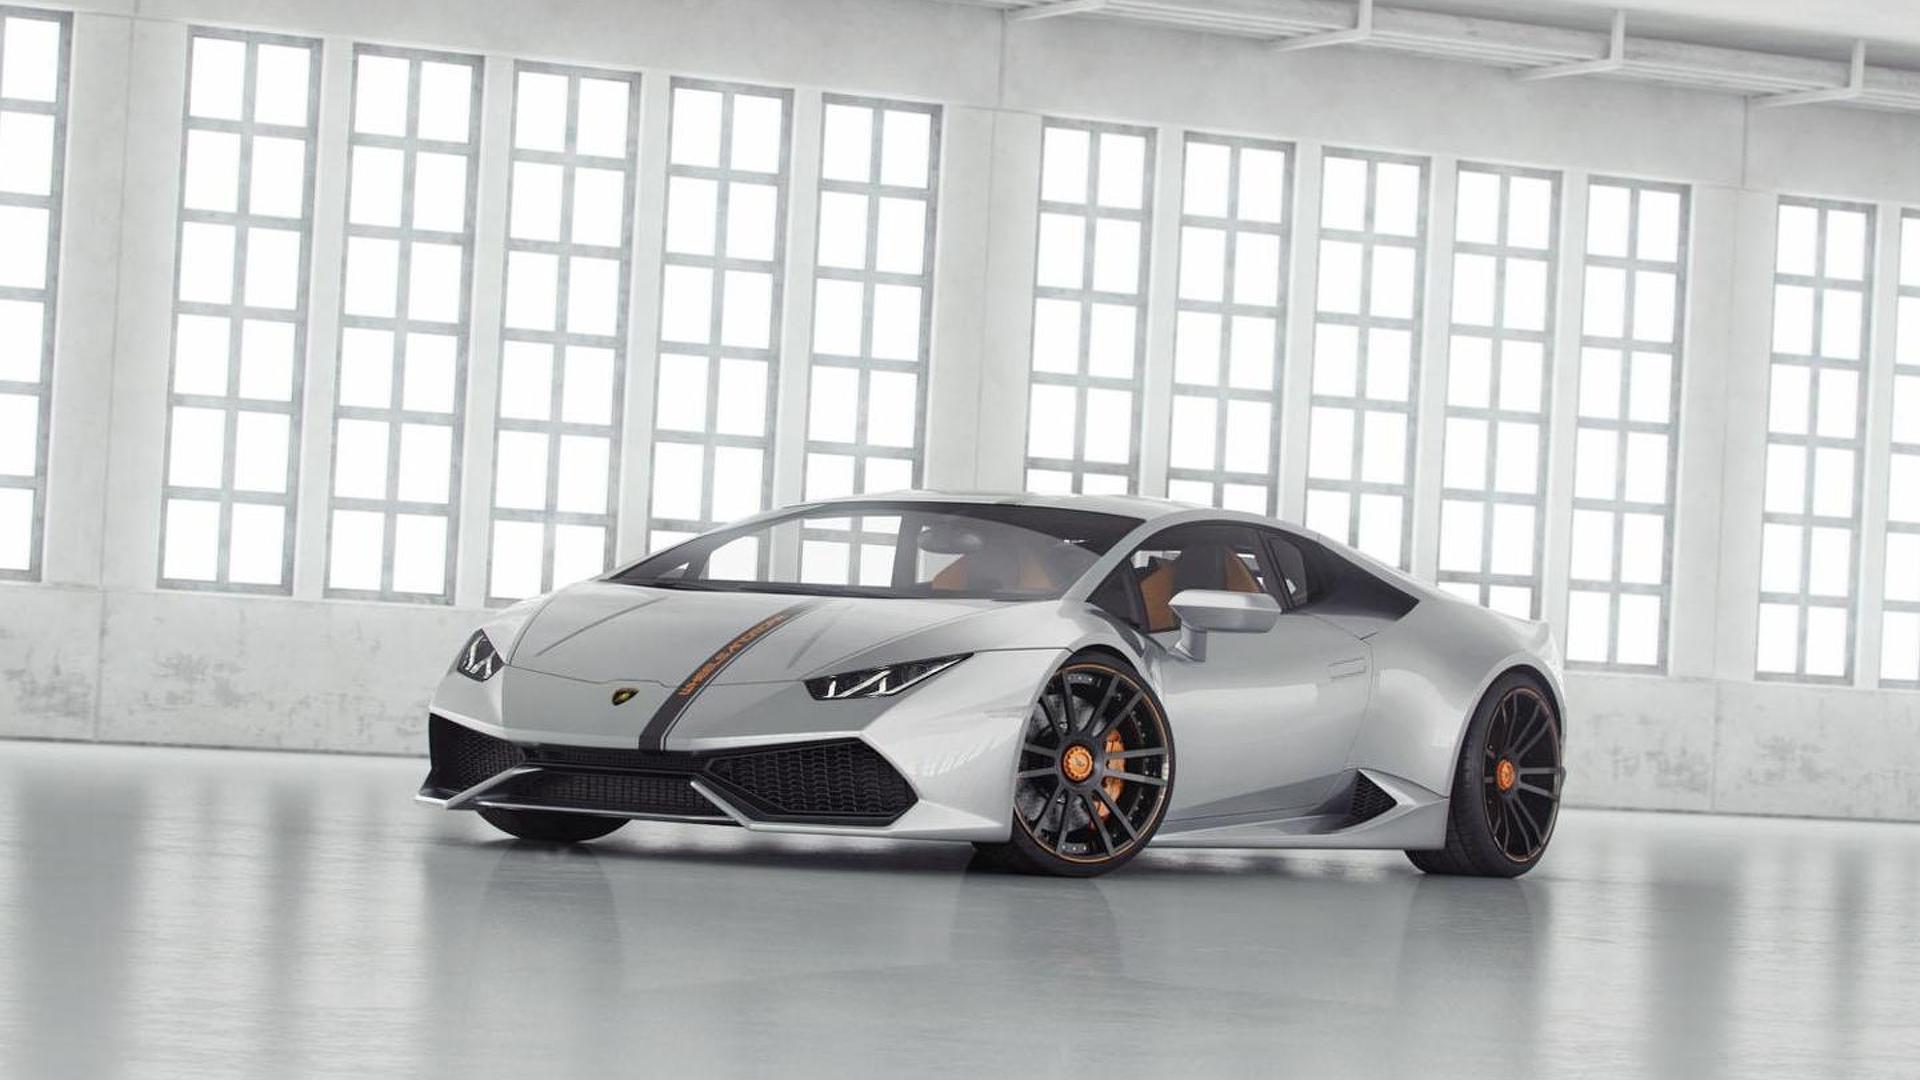 Lamborghini LP850-4 Huracan Lucifero introduced by Wheelsandmore